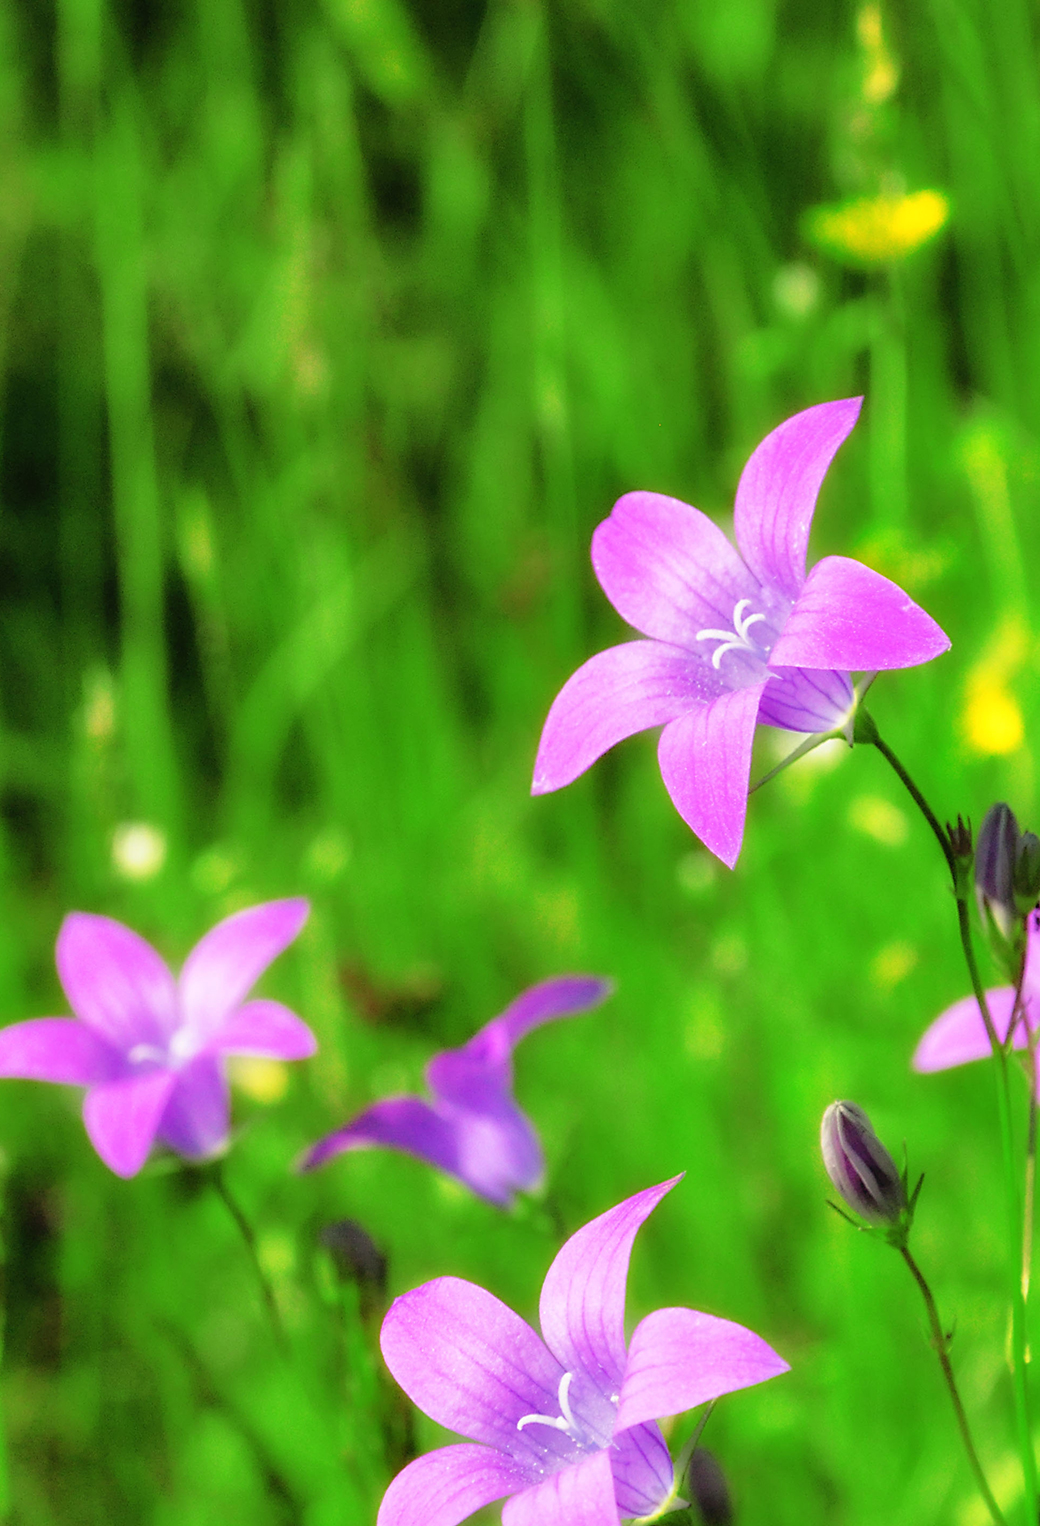 Purple Flower 3Wallpapers iphone Parallax Purple Flower